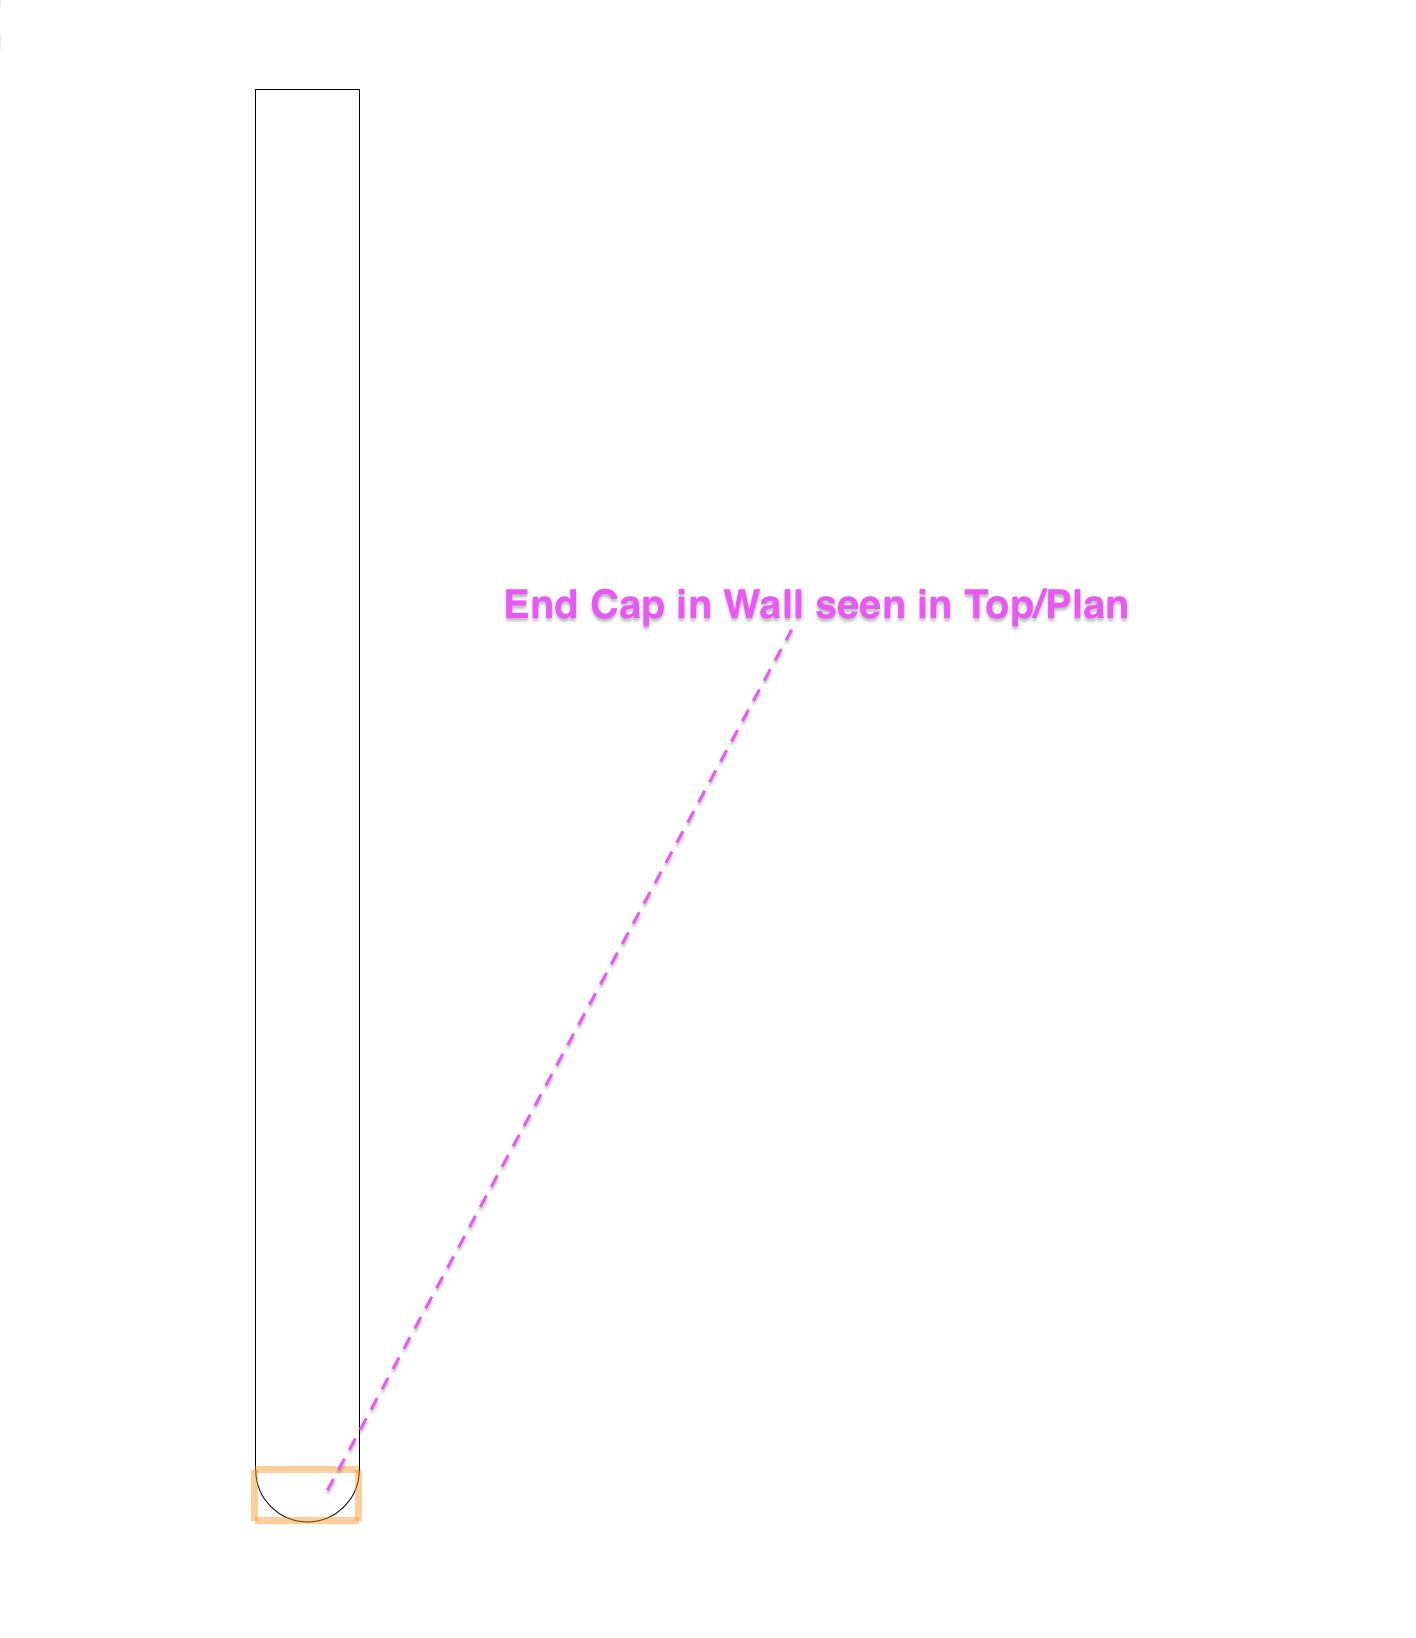 End Cap in Top:Plan.png